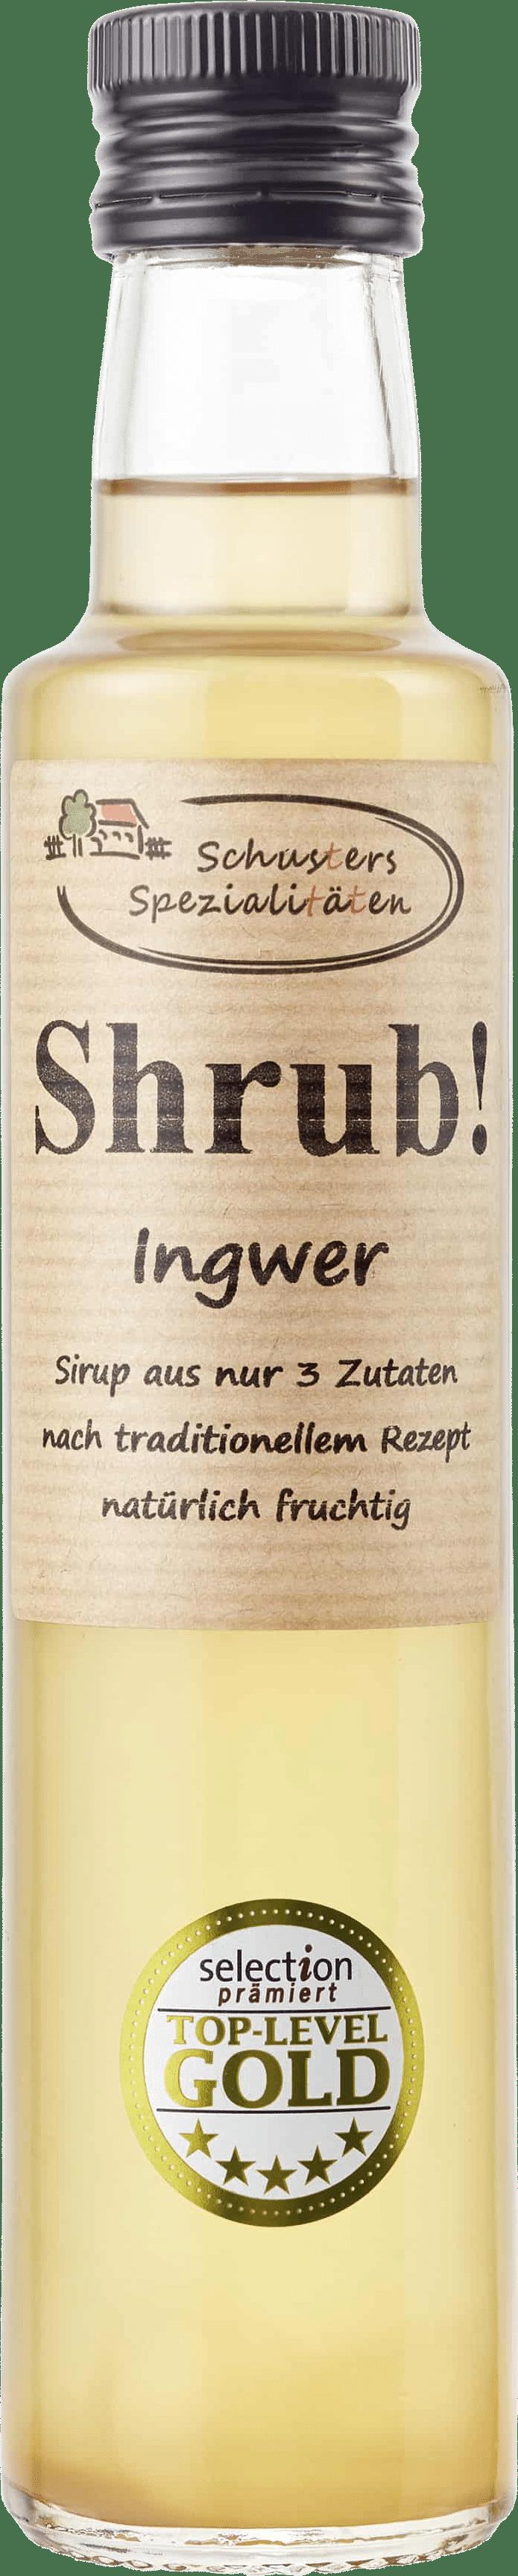 Shrub! Ingwer